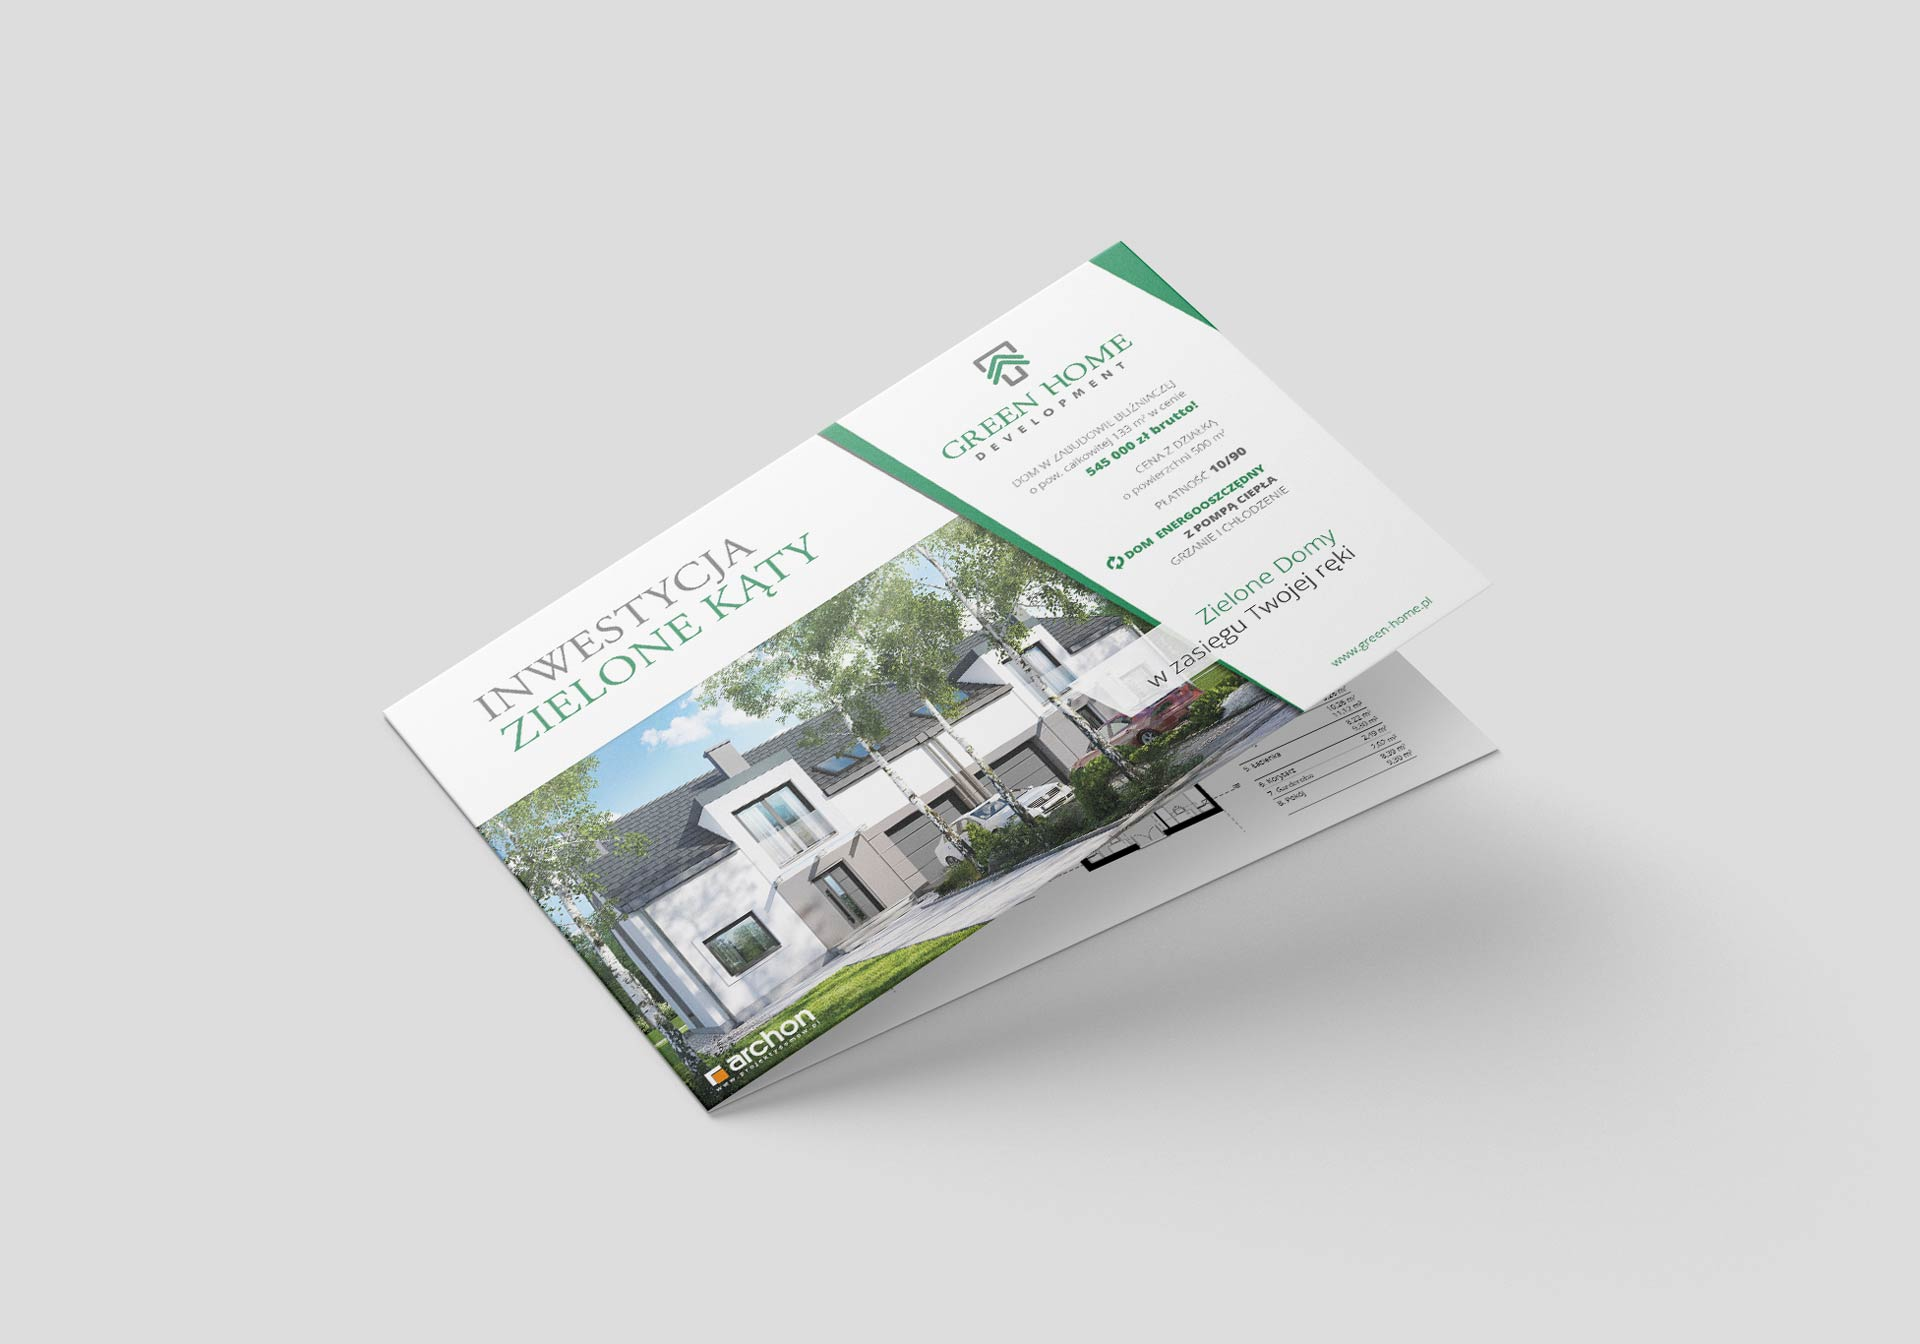 Ulotka reklamowa dla Green Home Development